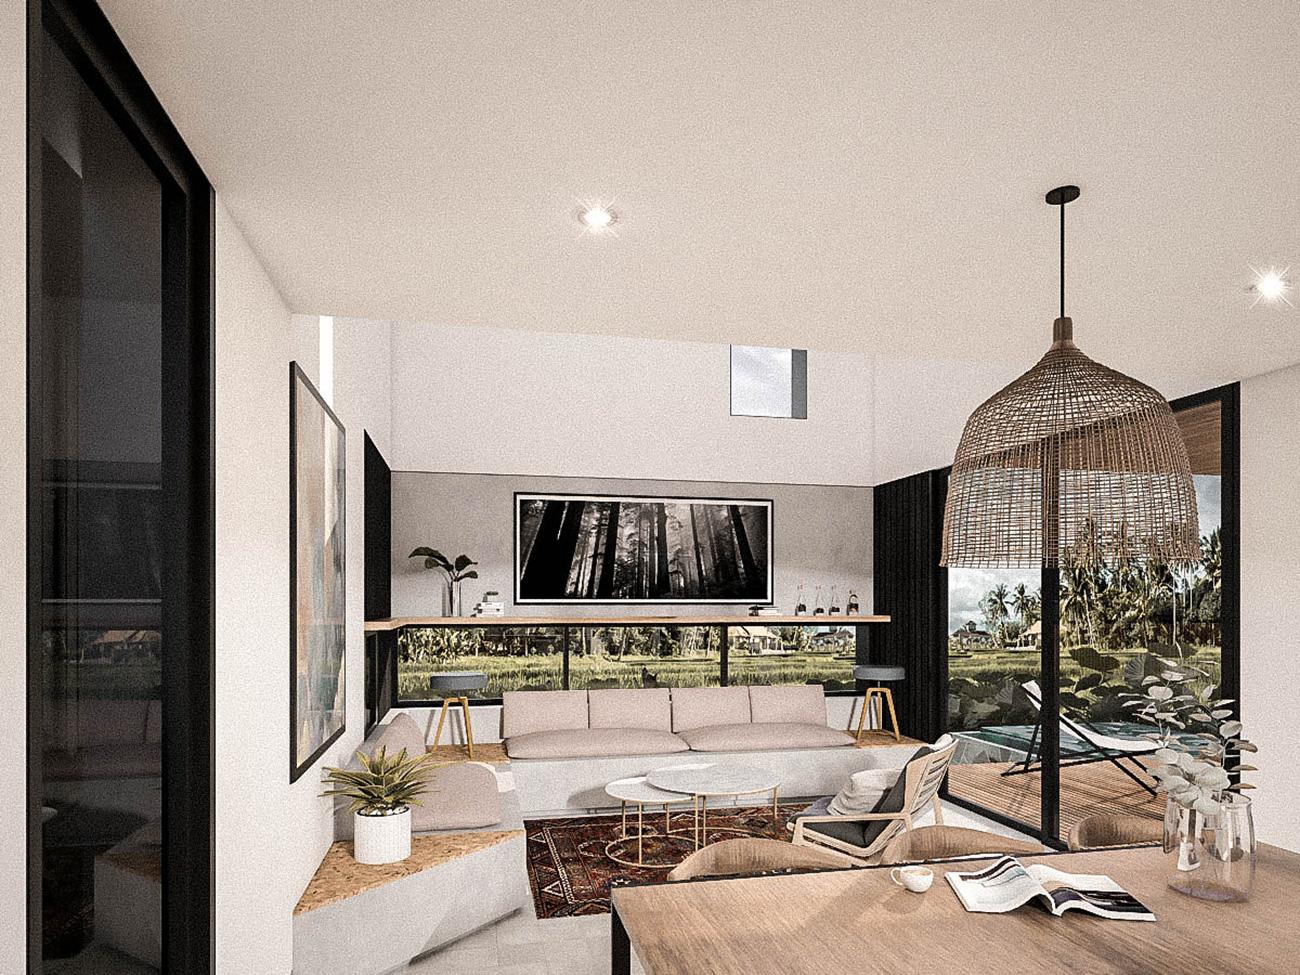 House-C-interior-1